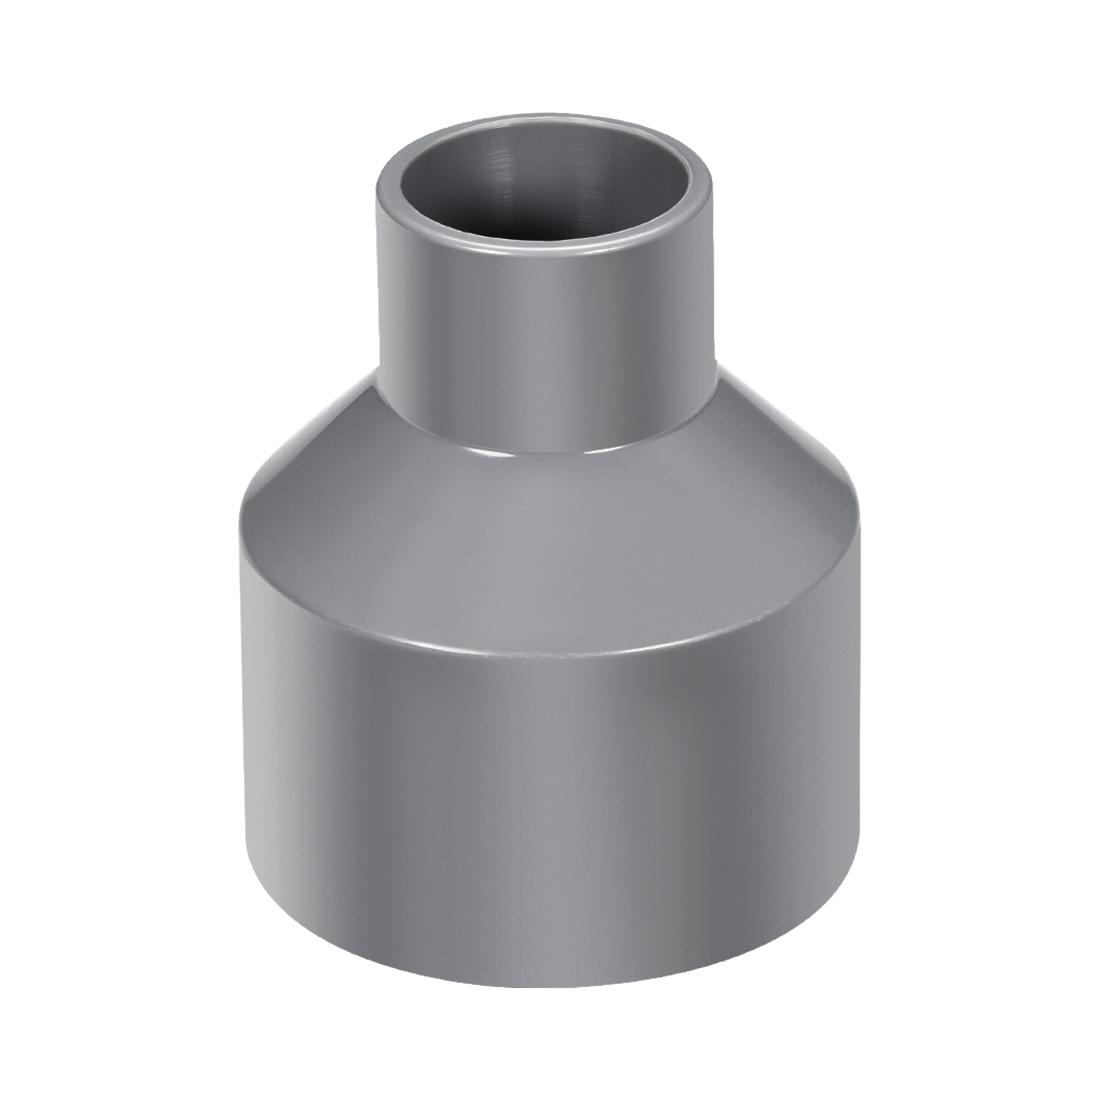 63mm x 32mm PVC Reducing Coupling Hub by Hub, DWV Pipe Fittings Gray